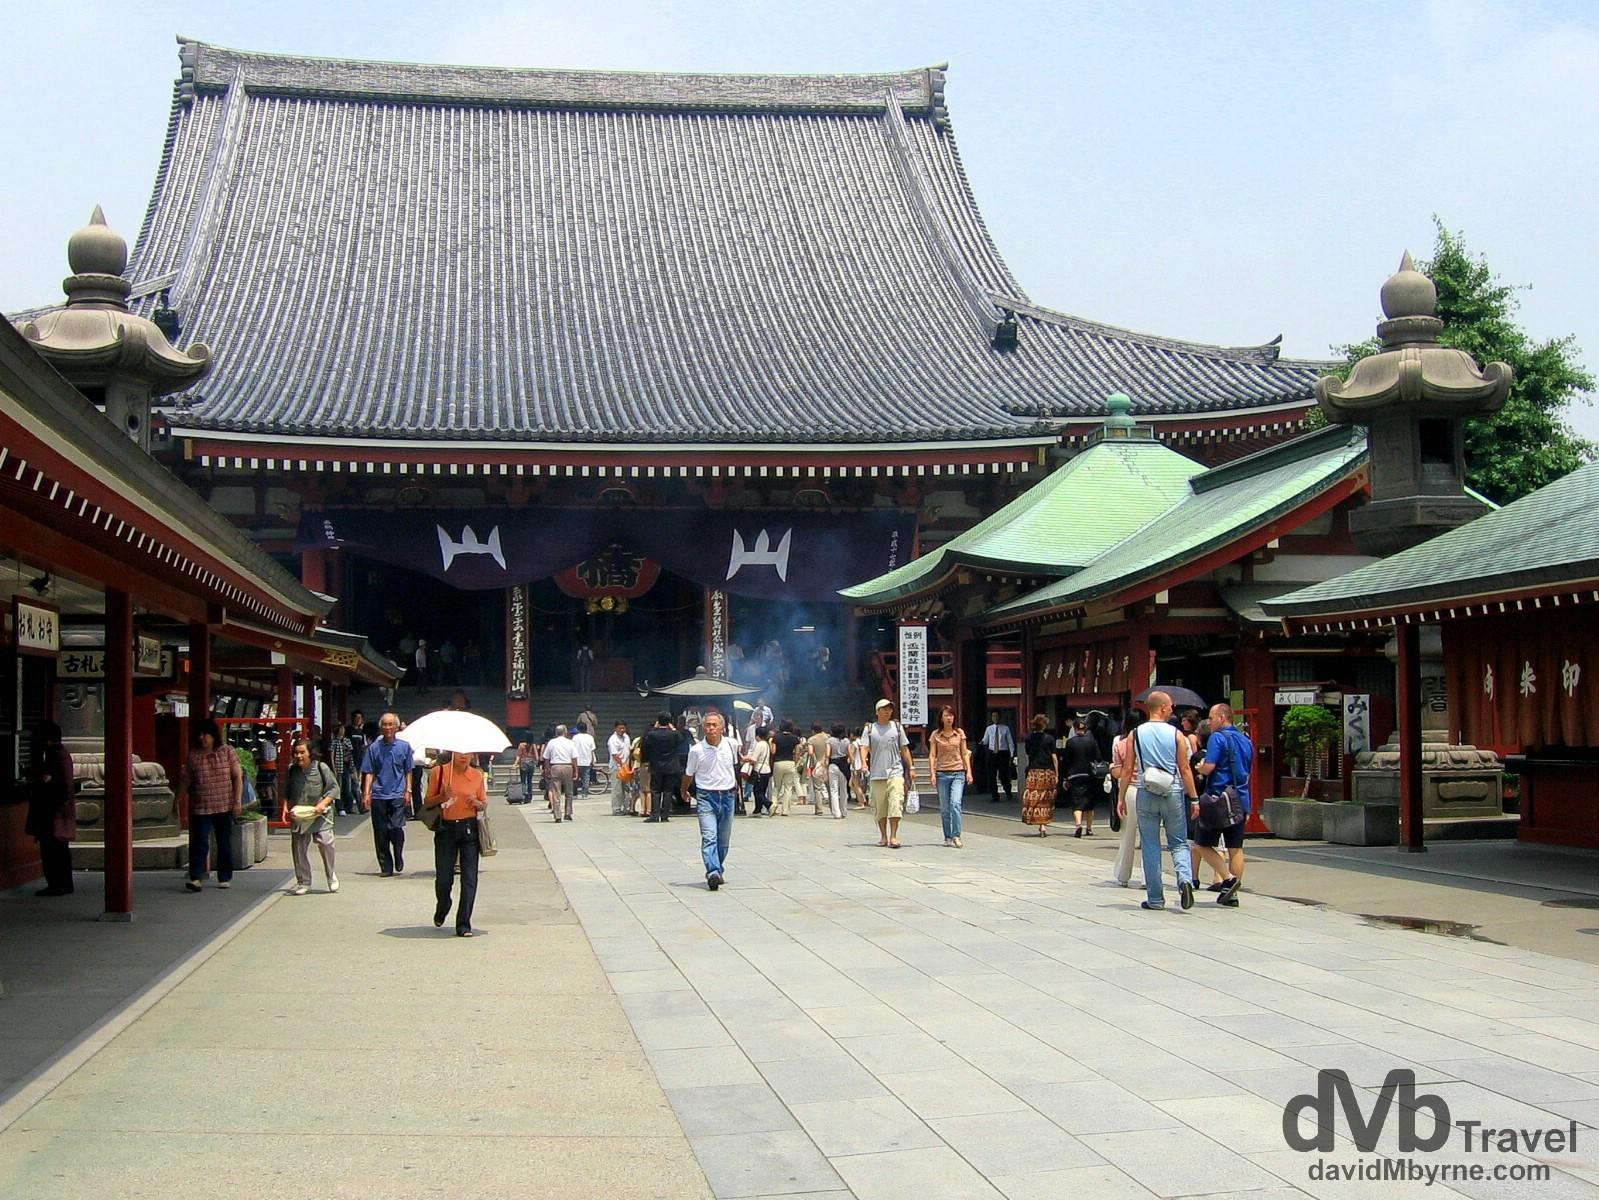 Senso Ji temple complex, Tokyo, Japan. July 15th, 2005.